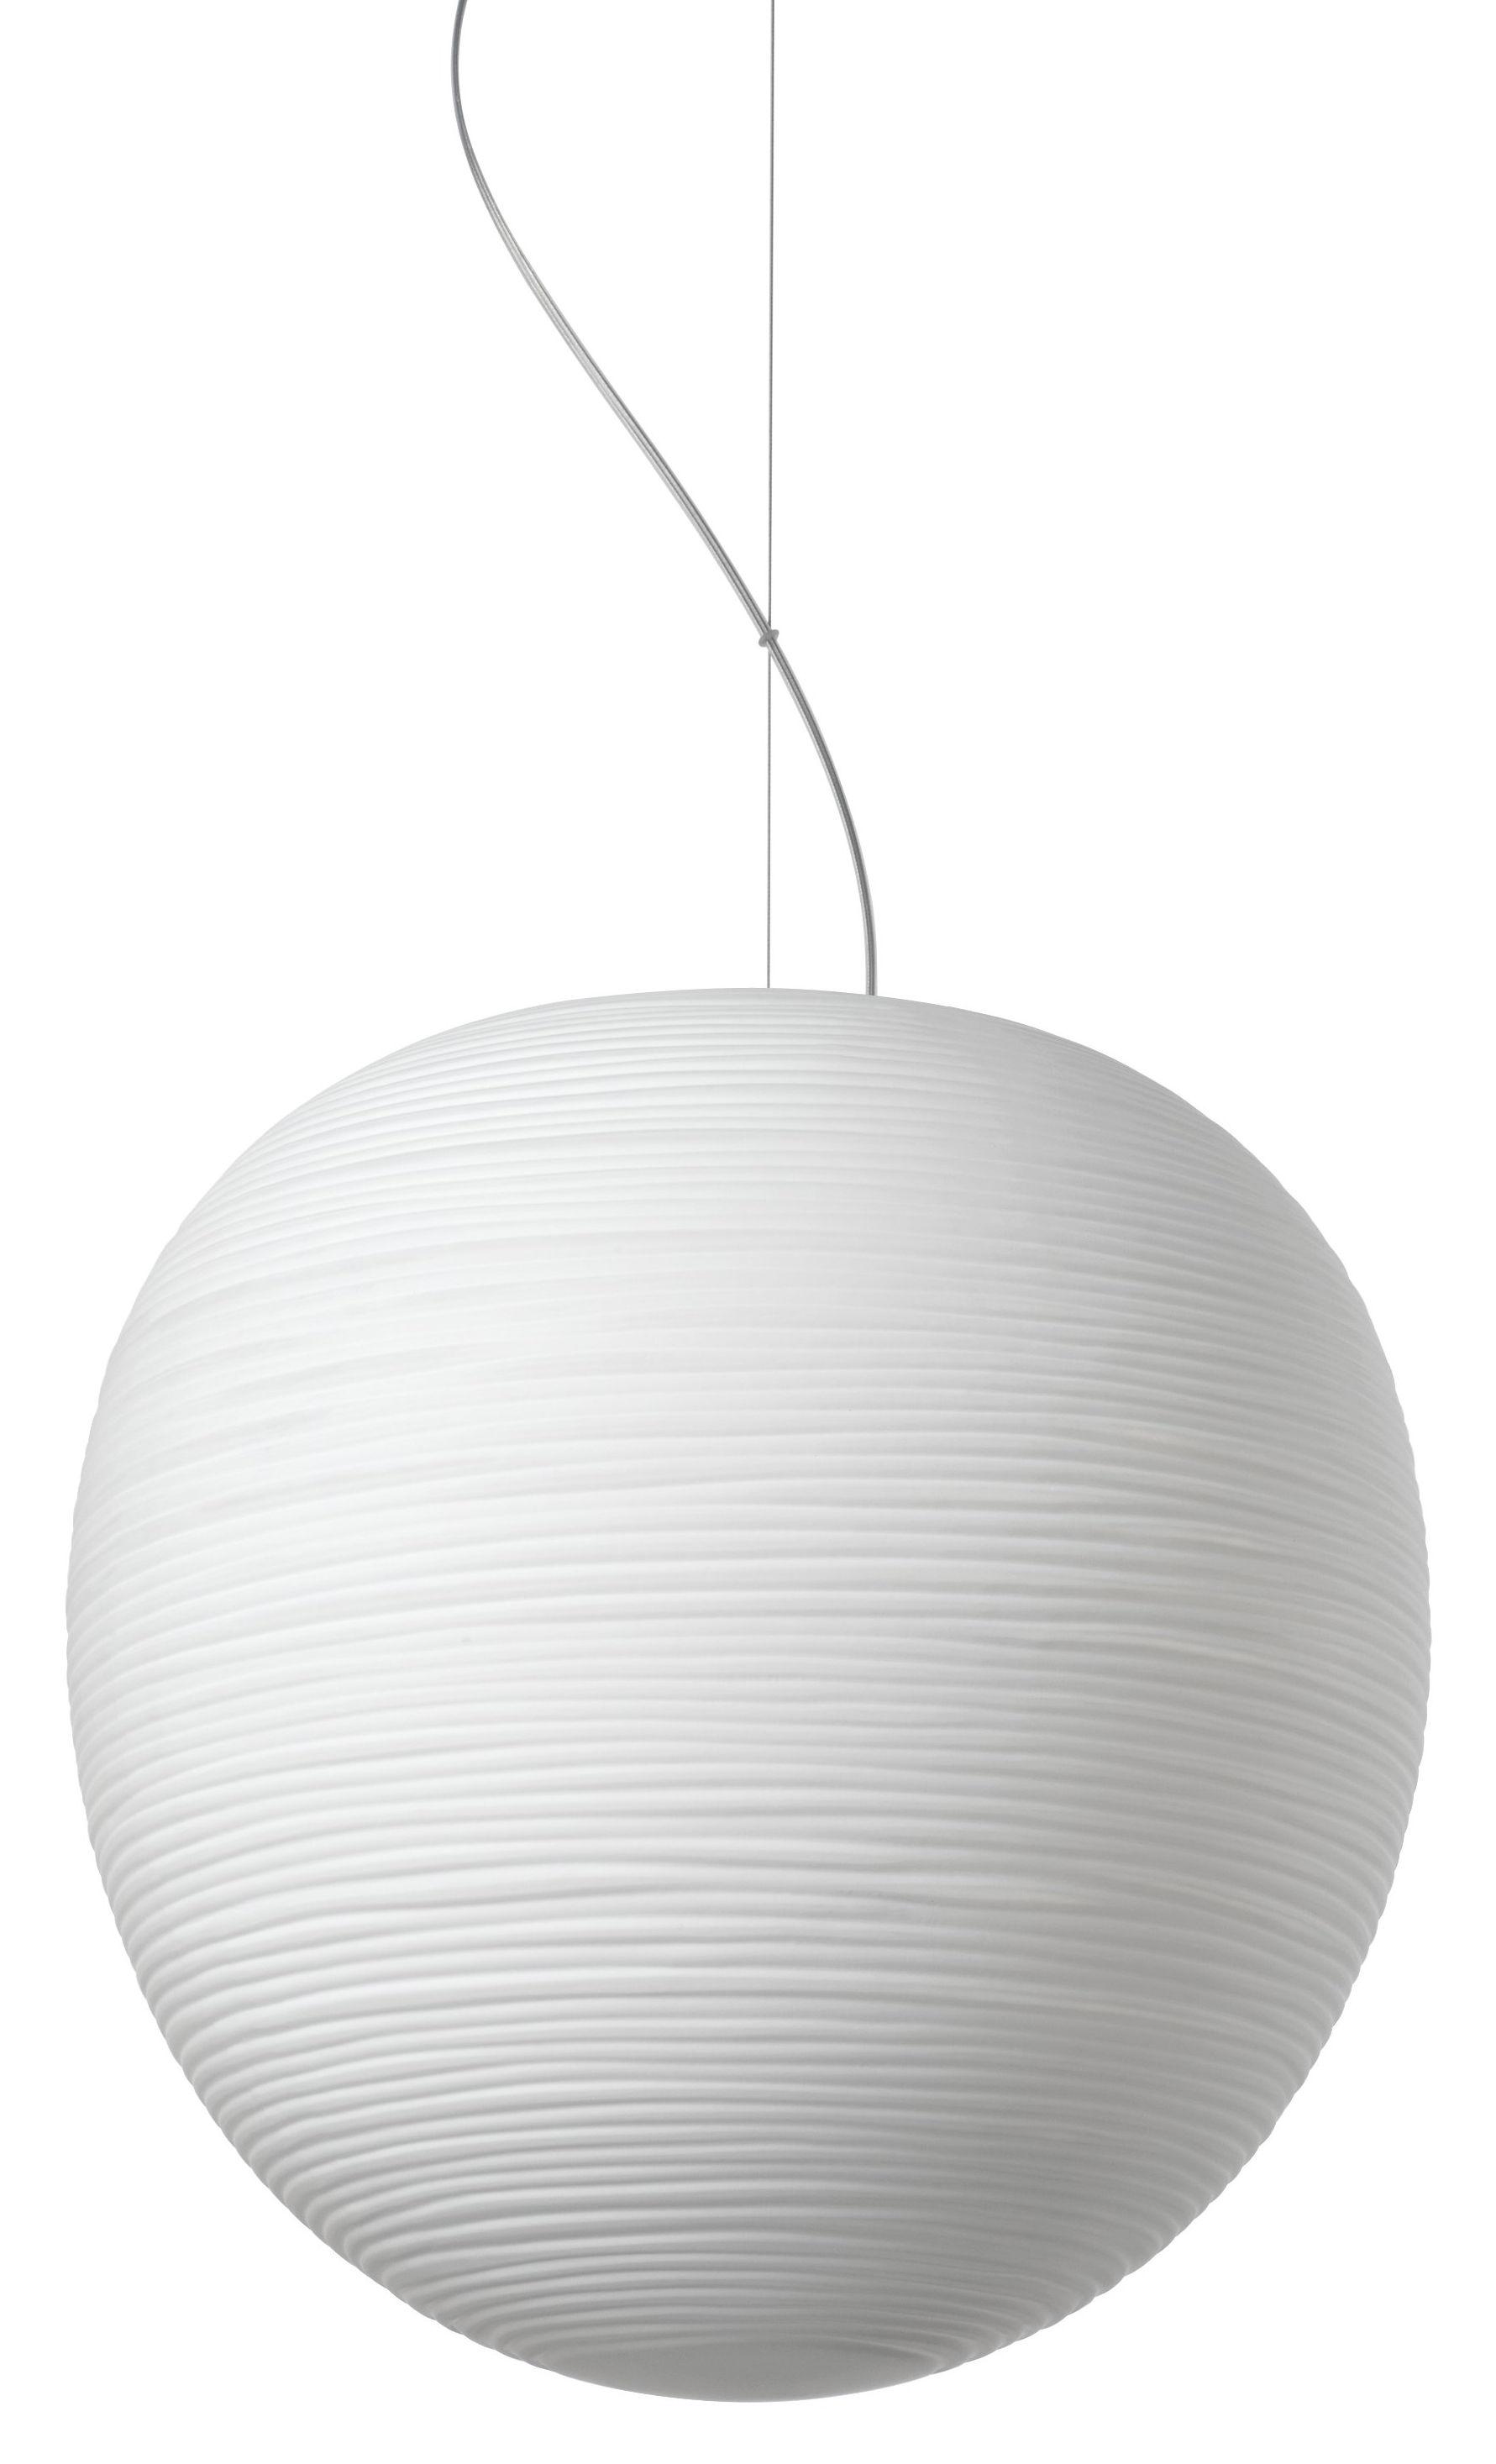 Luminaire - Suspensions - Suspension Rituals XL / Ø 40 x H 41 cm - Foscarini - Blanc / Ø 40 x H 41 cm - Verre soufflé bouche